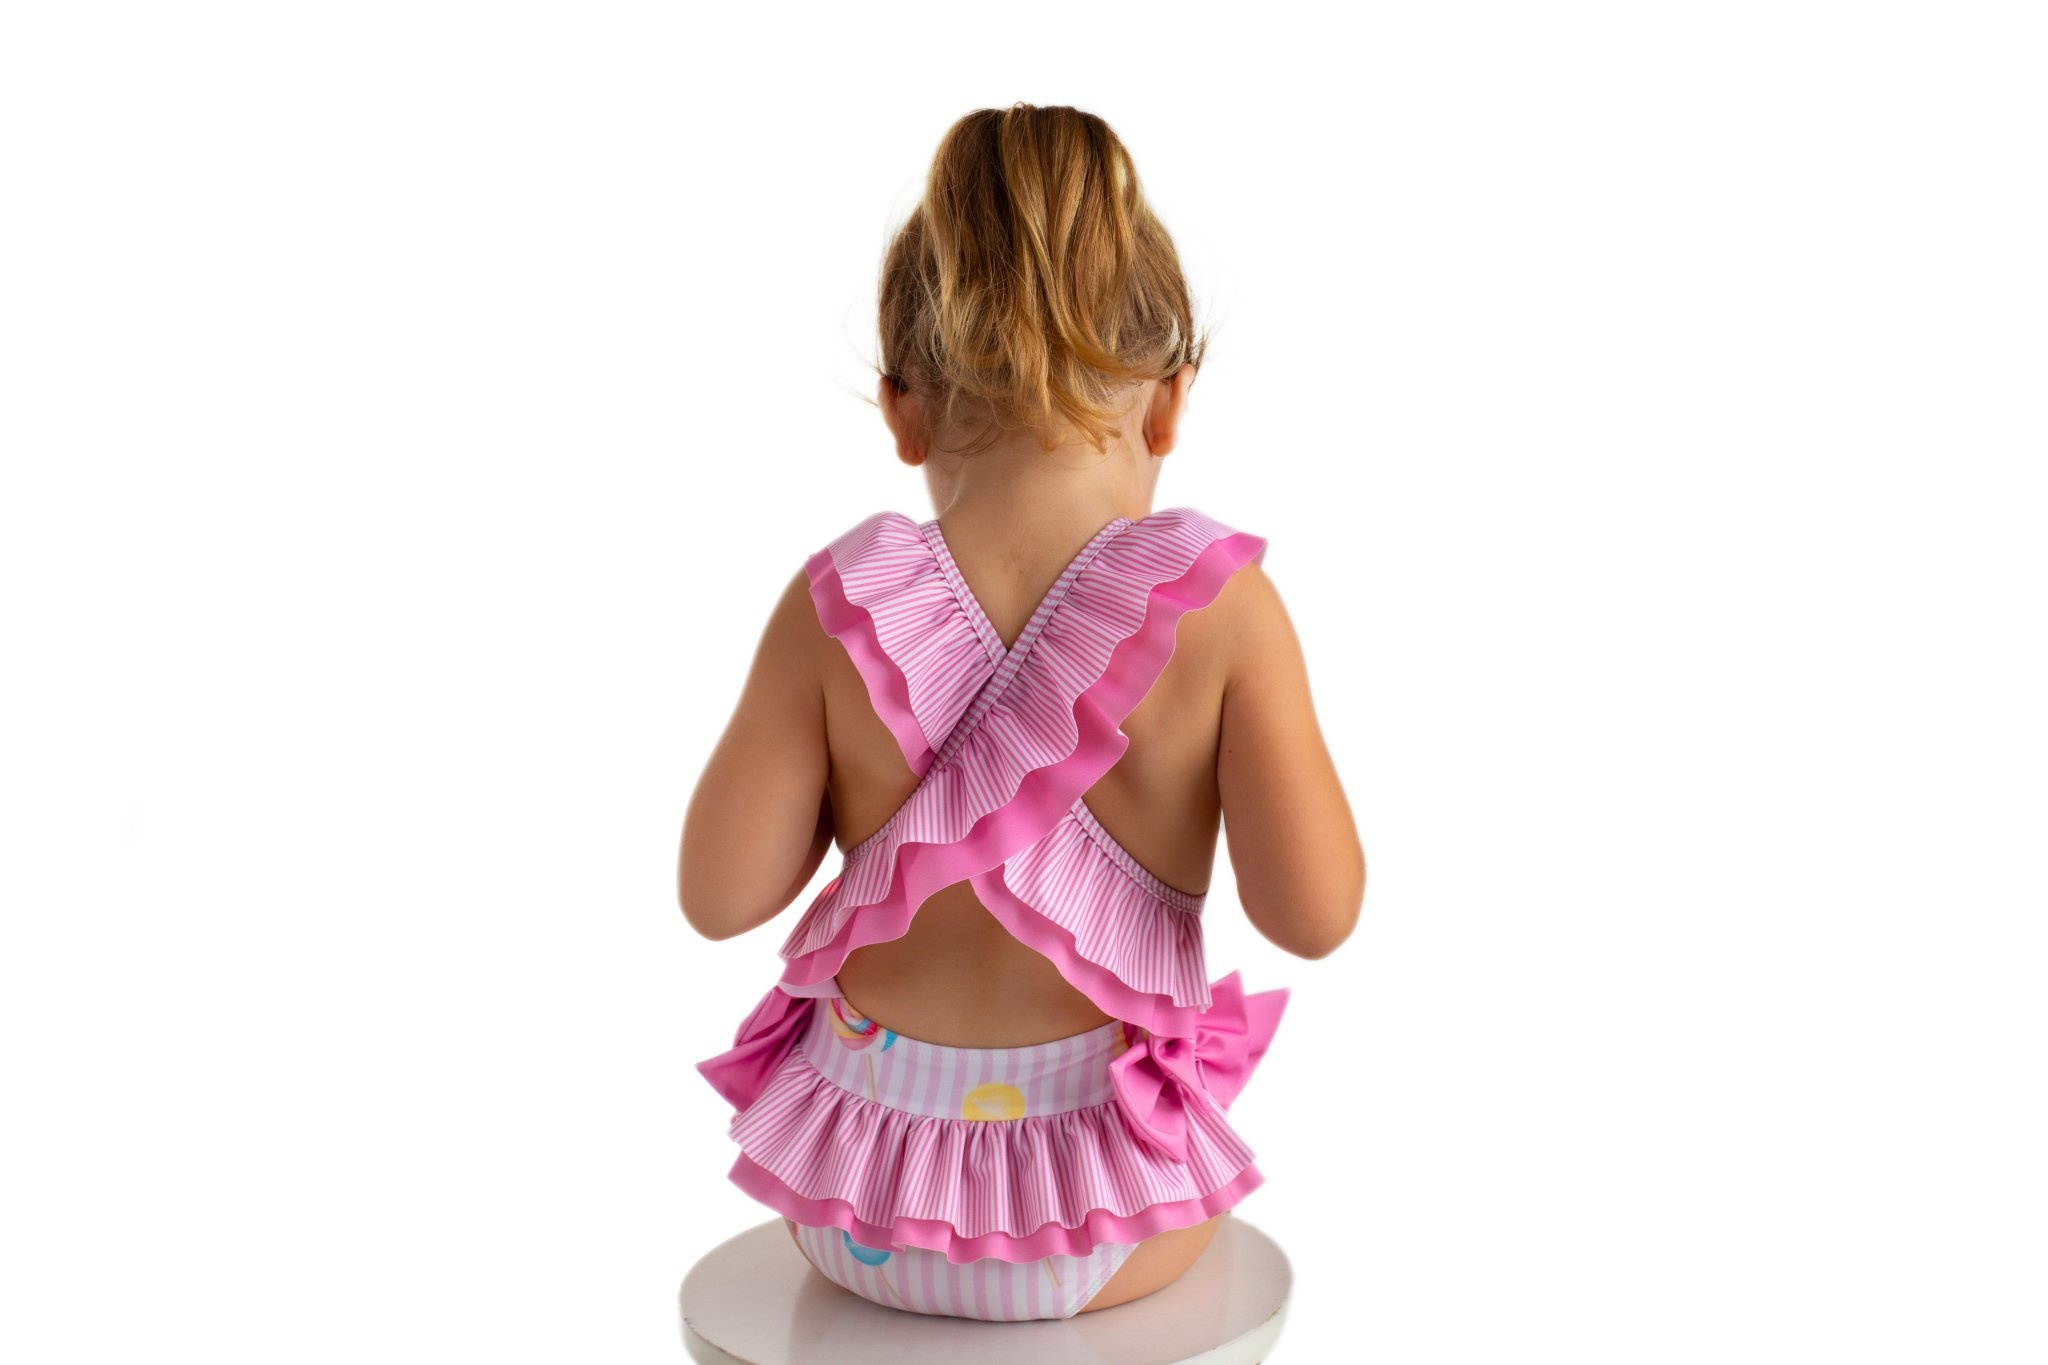 Meia Pata Meia Pata Lollipop Swimming Costume S21